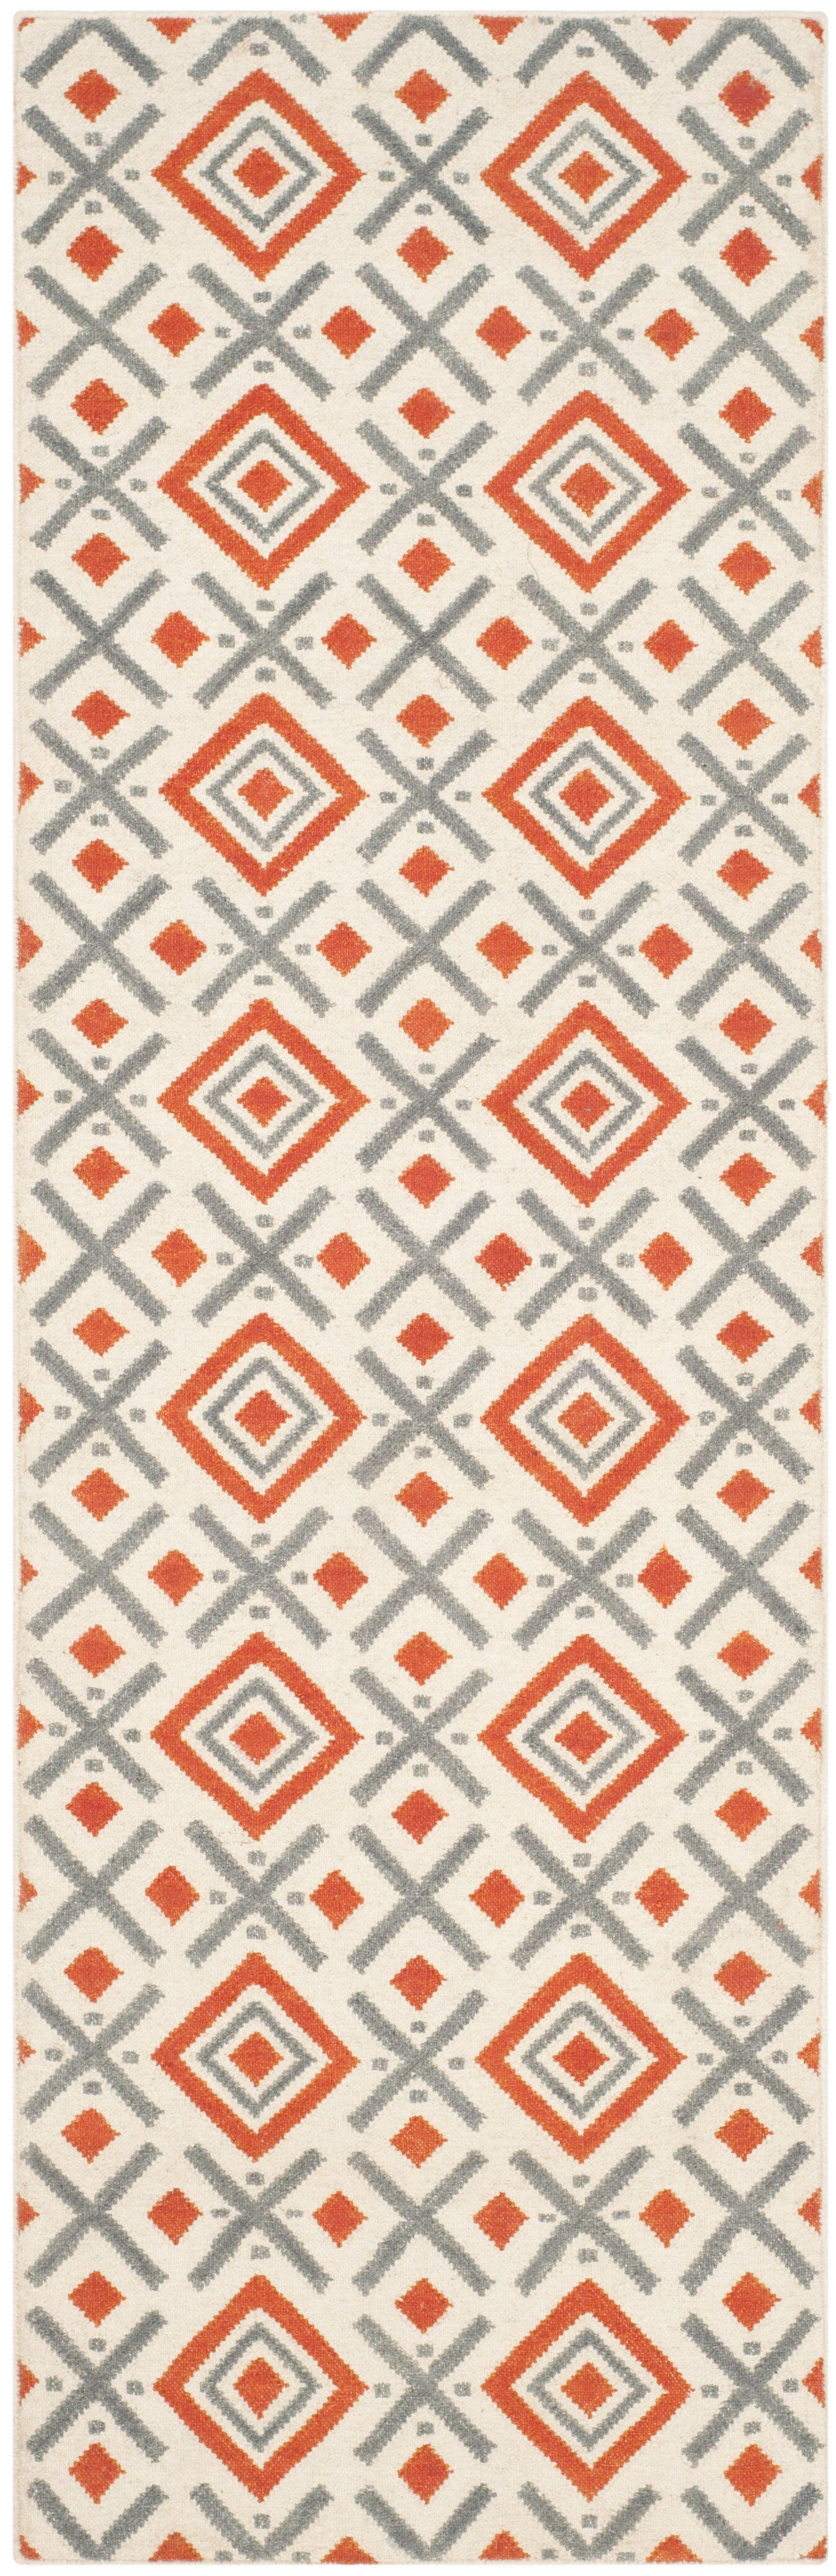 Dhurries Ivory / Tangerine Area Rug Rug Size: Runner 2'6